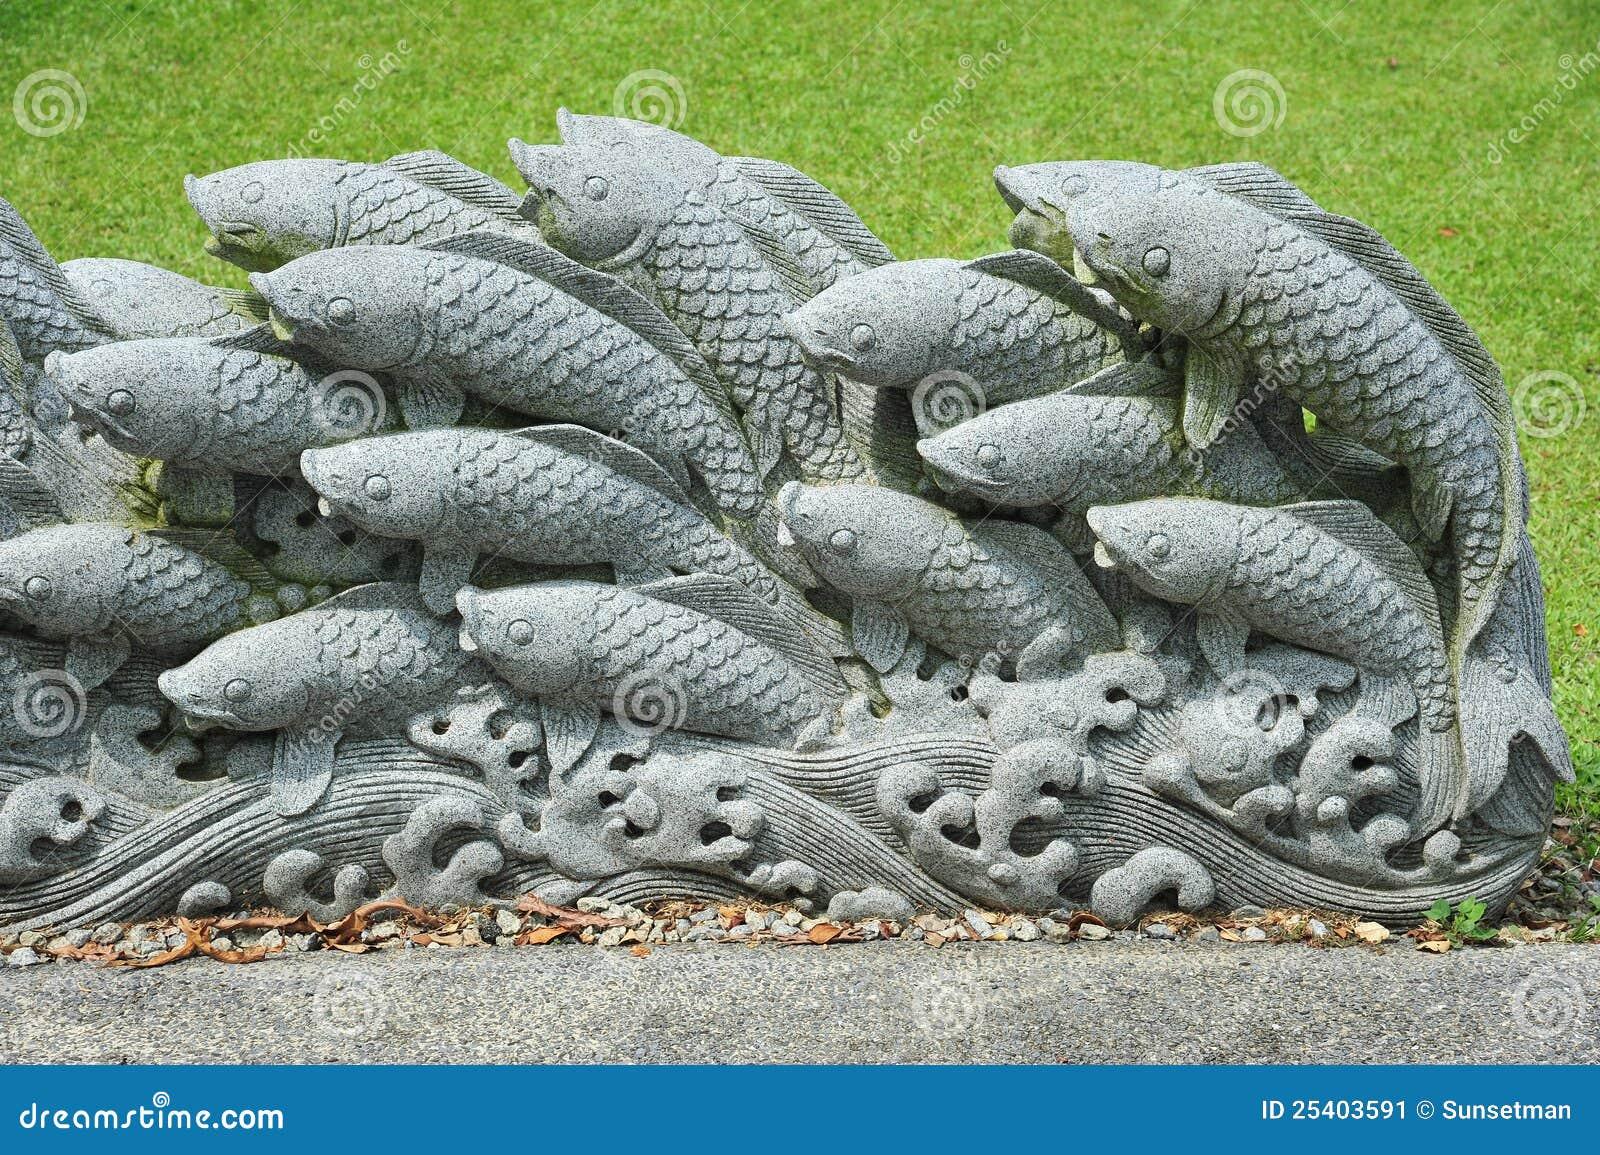 Koi stone carving stock image